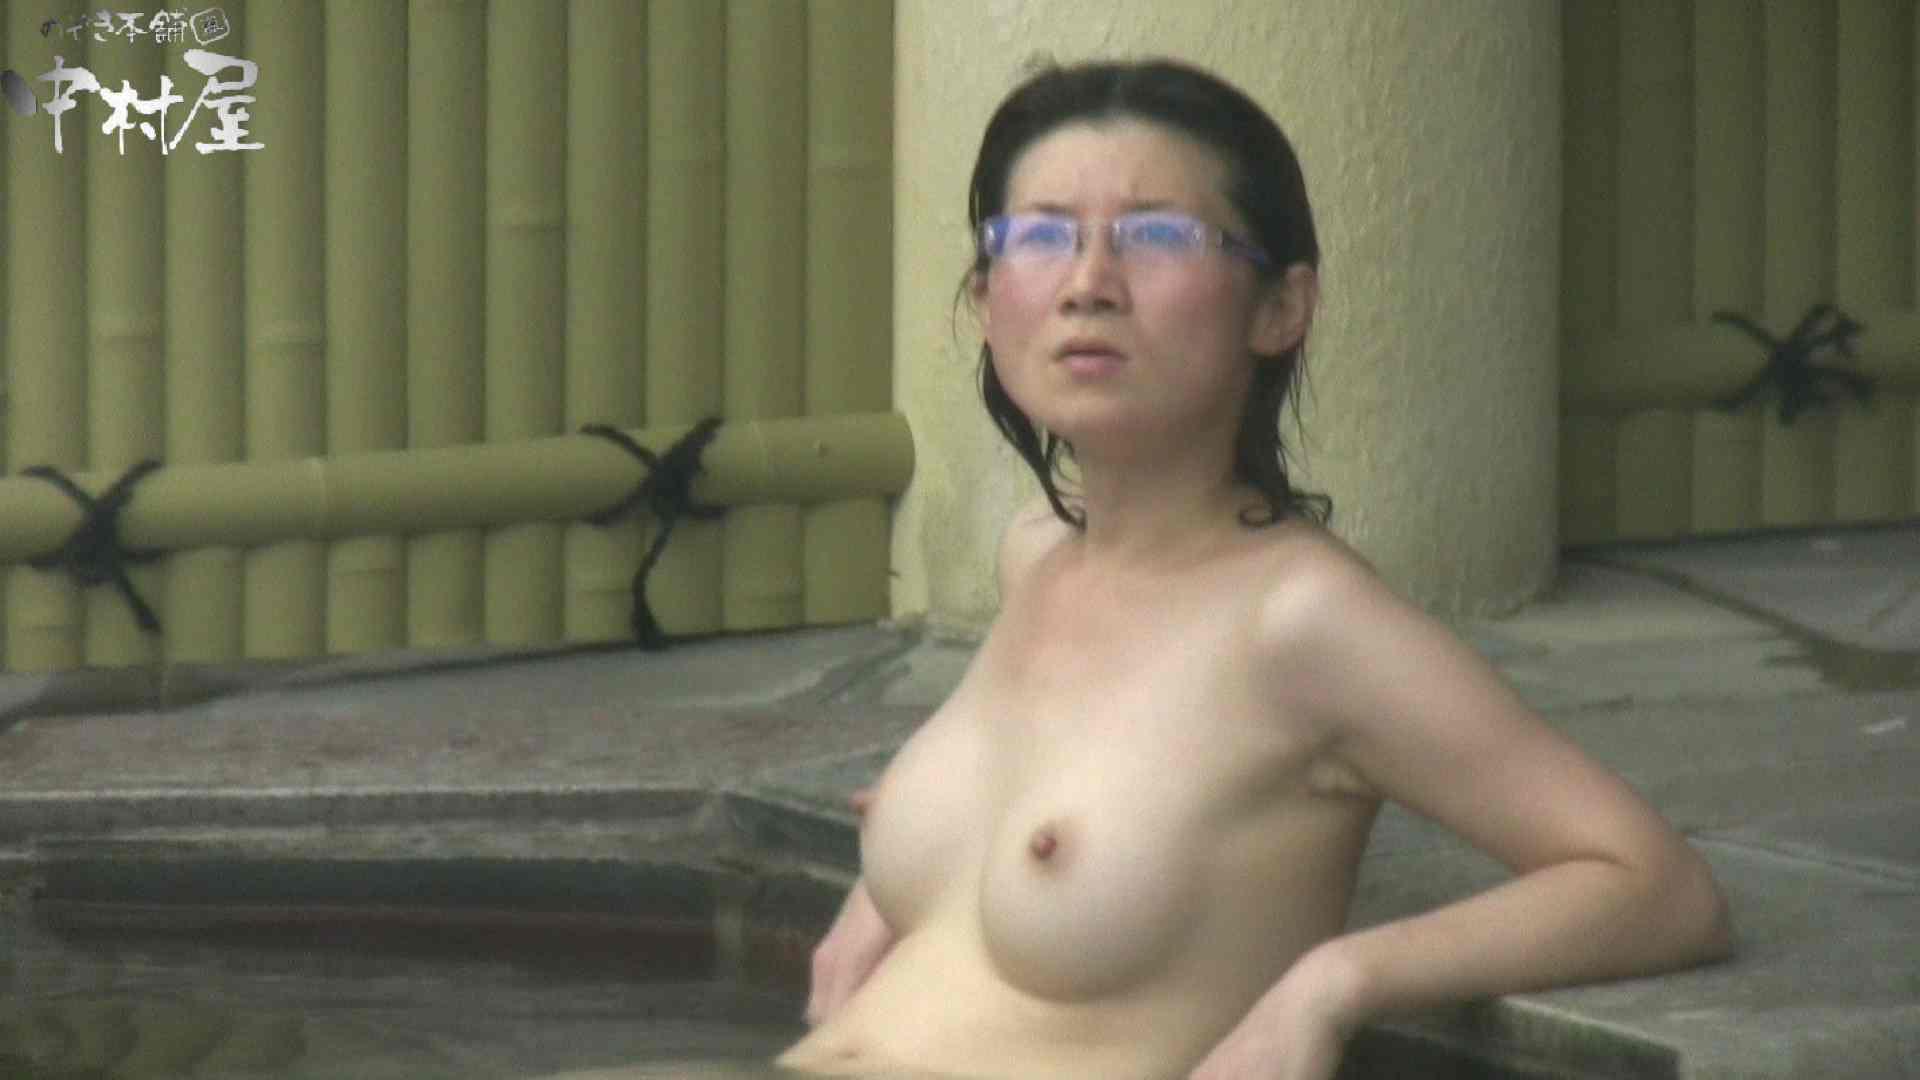 Aquaな露天風呂Vol.905 露天風呂   OLのエロ生活  99連発 10